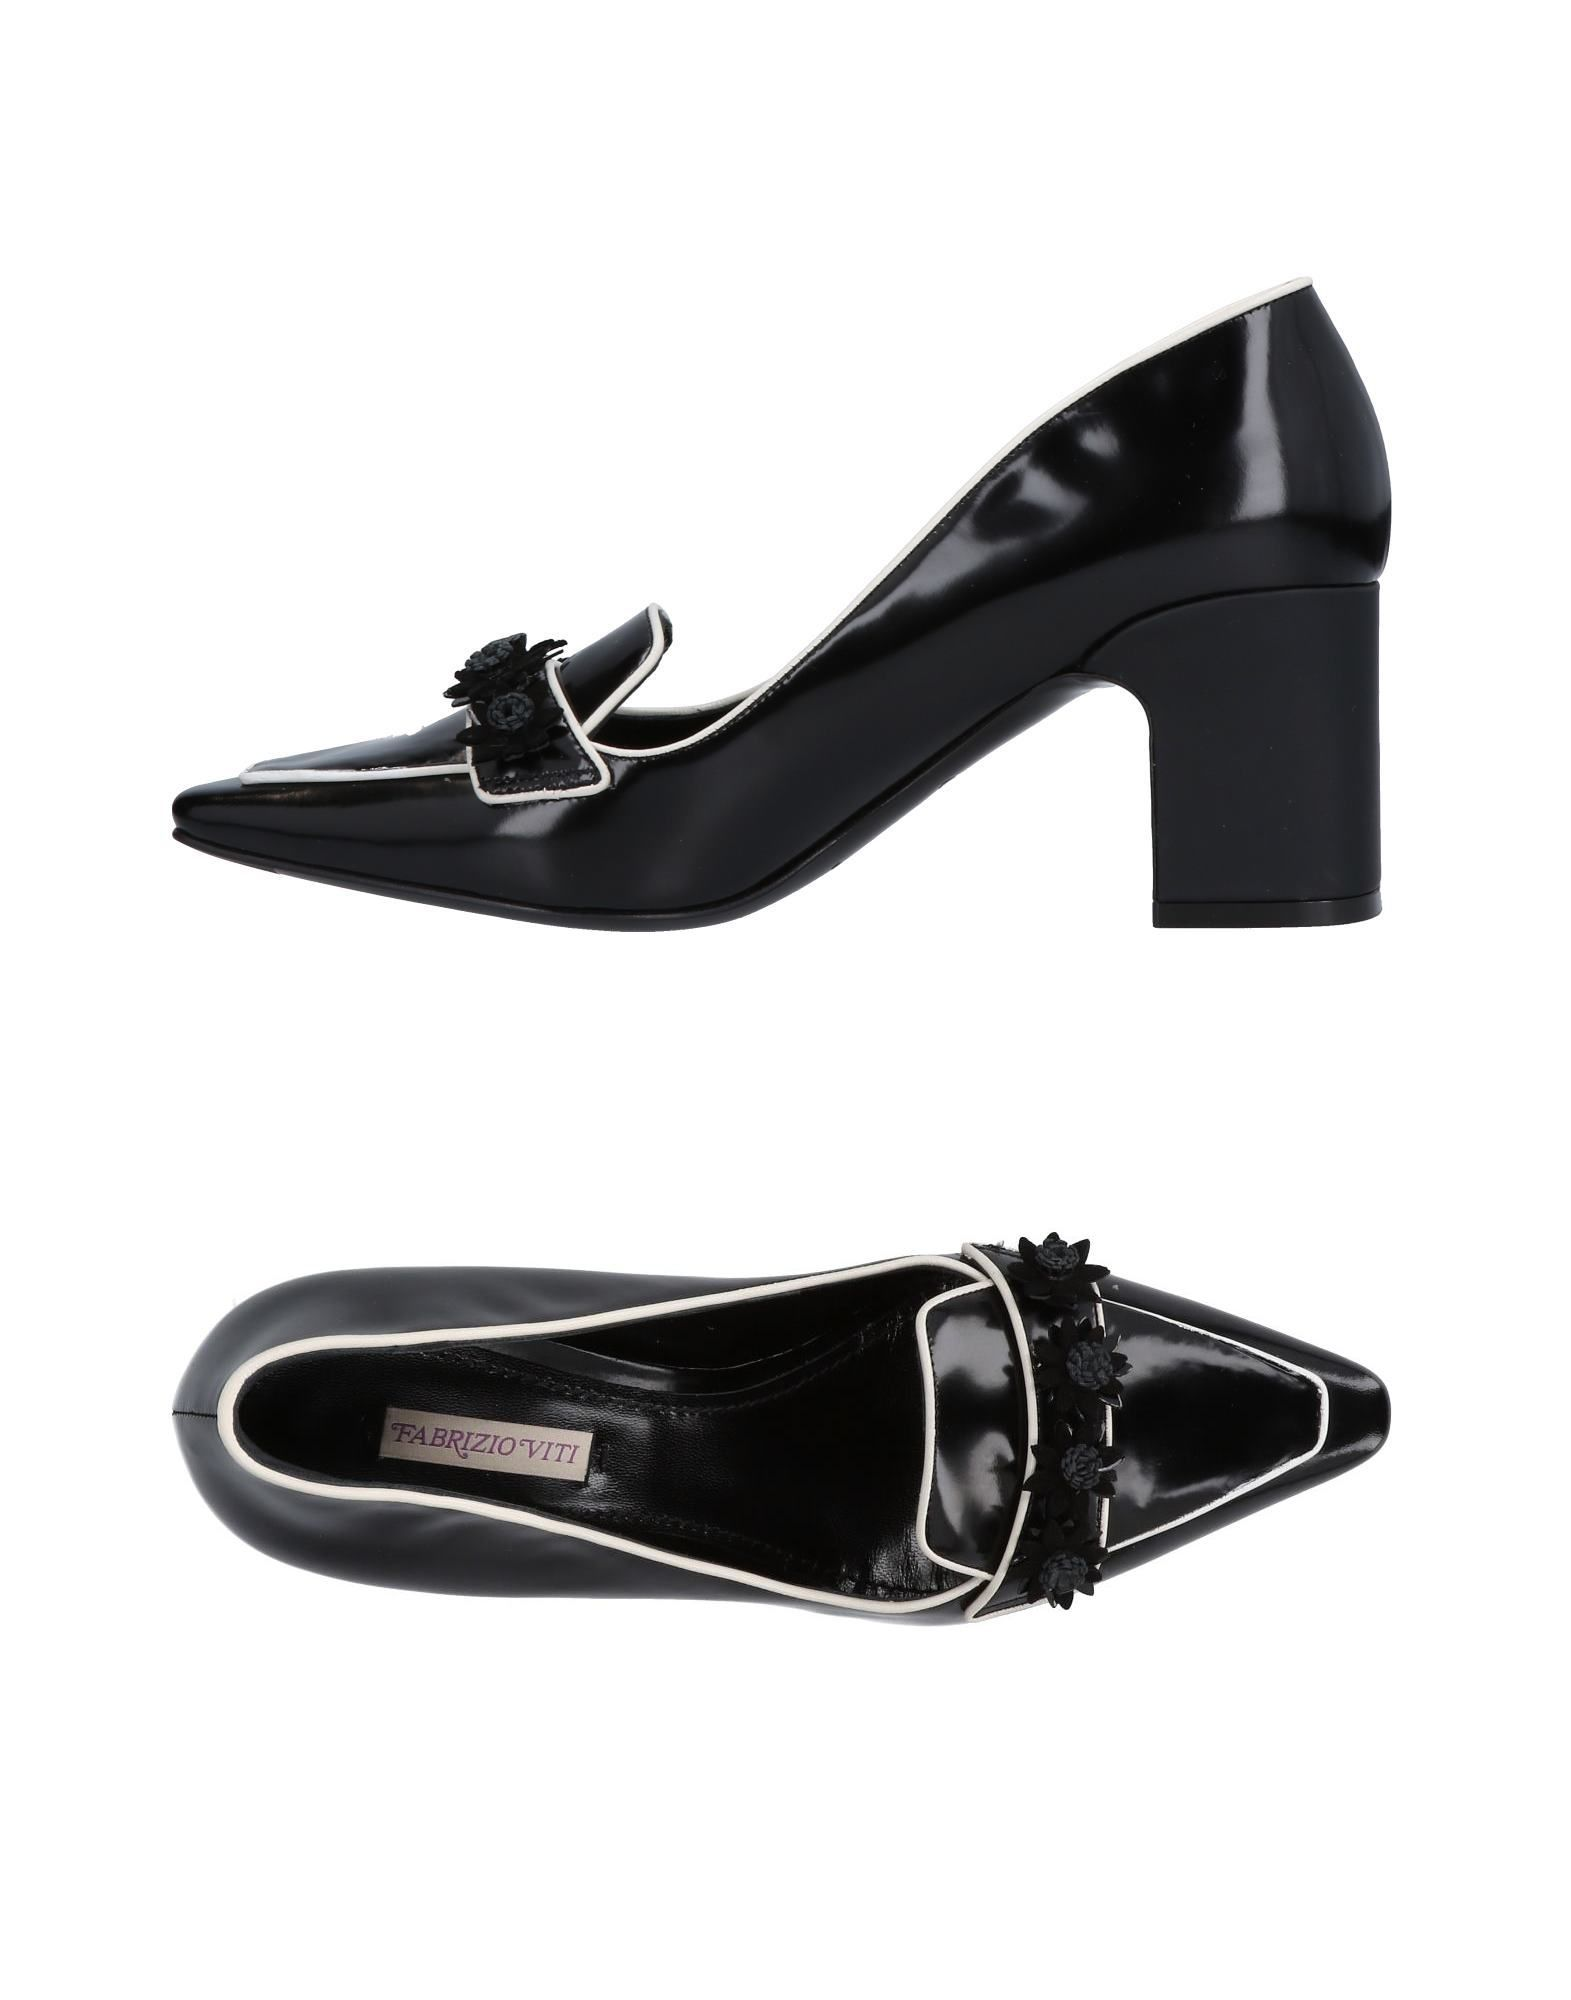 Fabrizio Viti Mokassins Damen  11475376OR Gute Qualität beliebte Schuhe